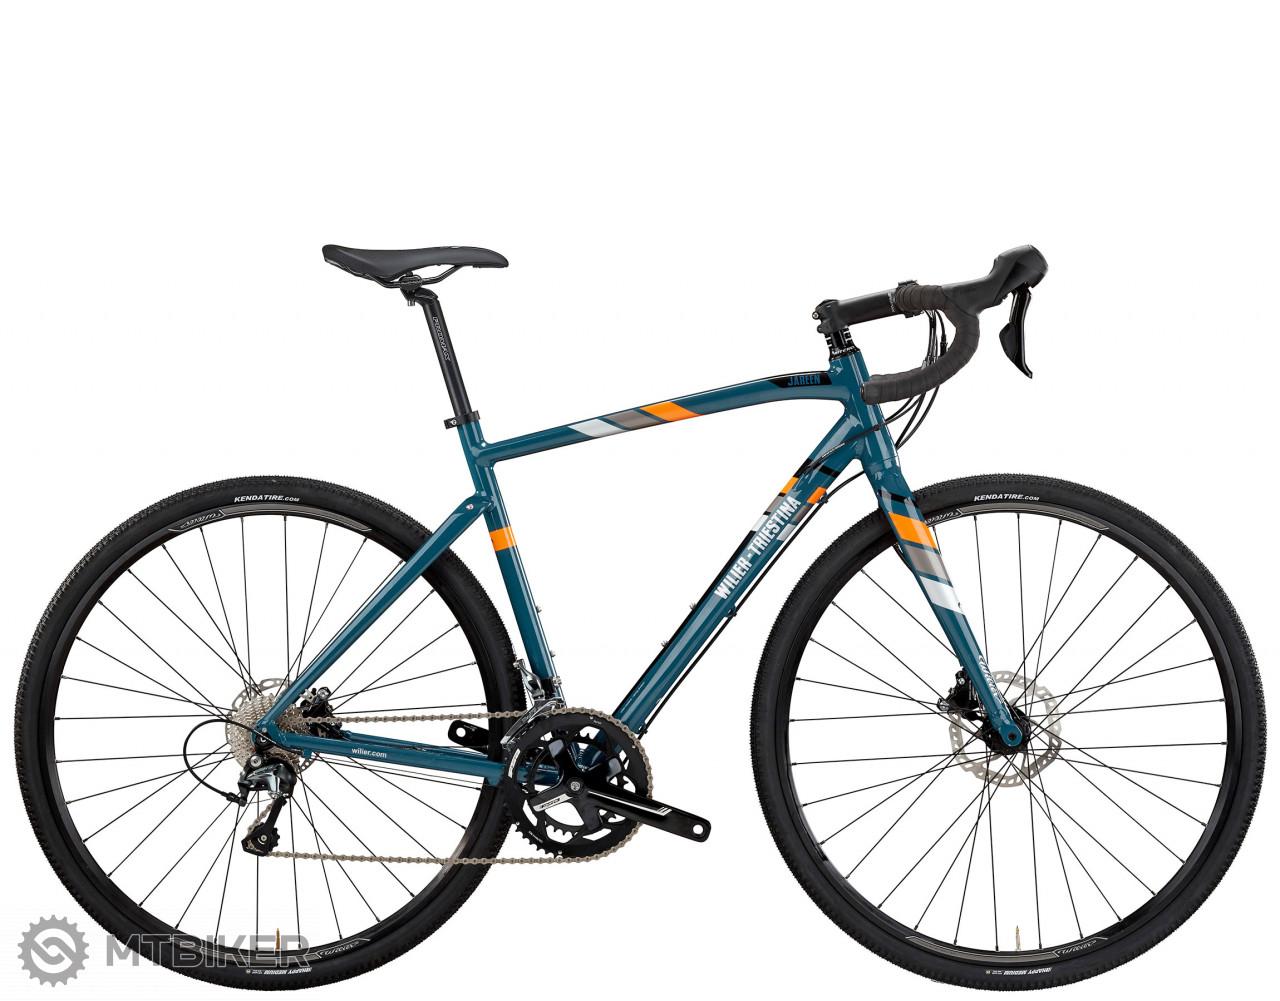 Wilier JAREEN TIAGRA - J1 BLUE PETROLEUM GLOSSY, model 2019